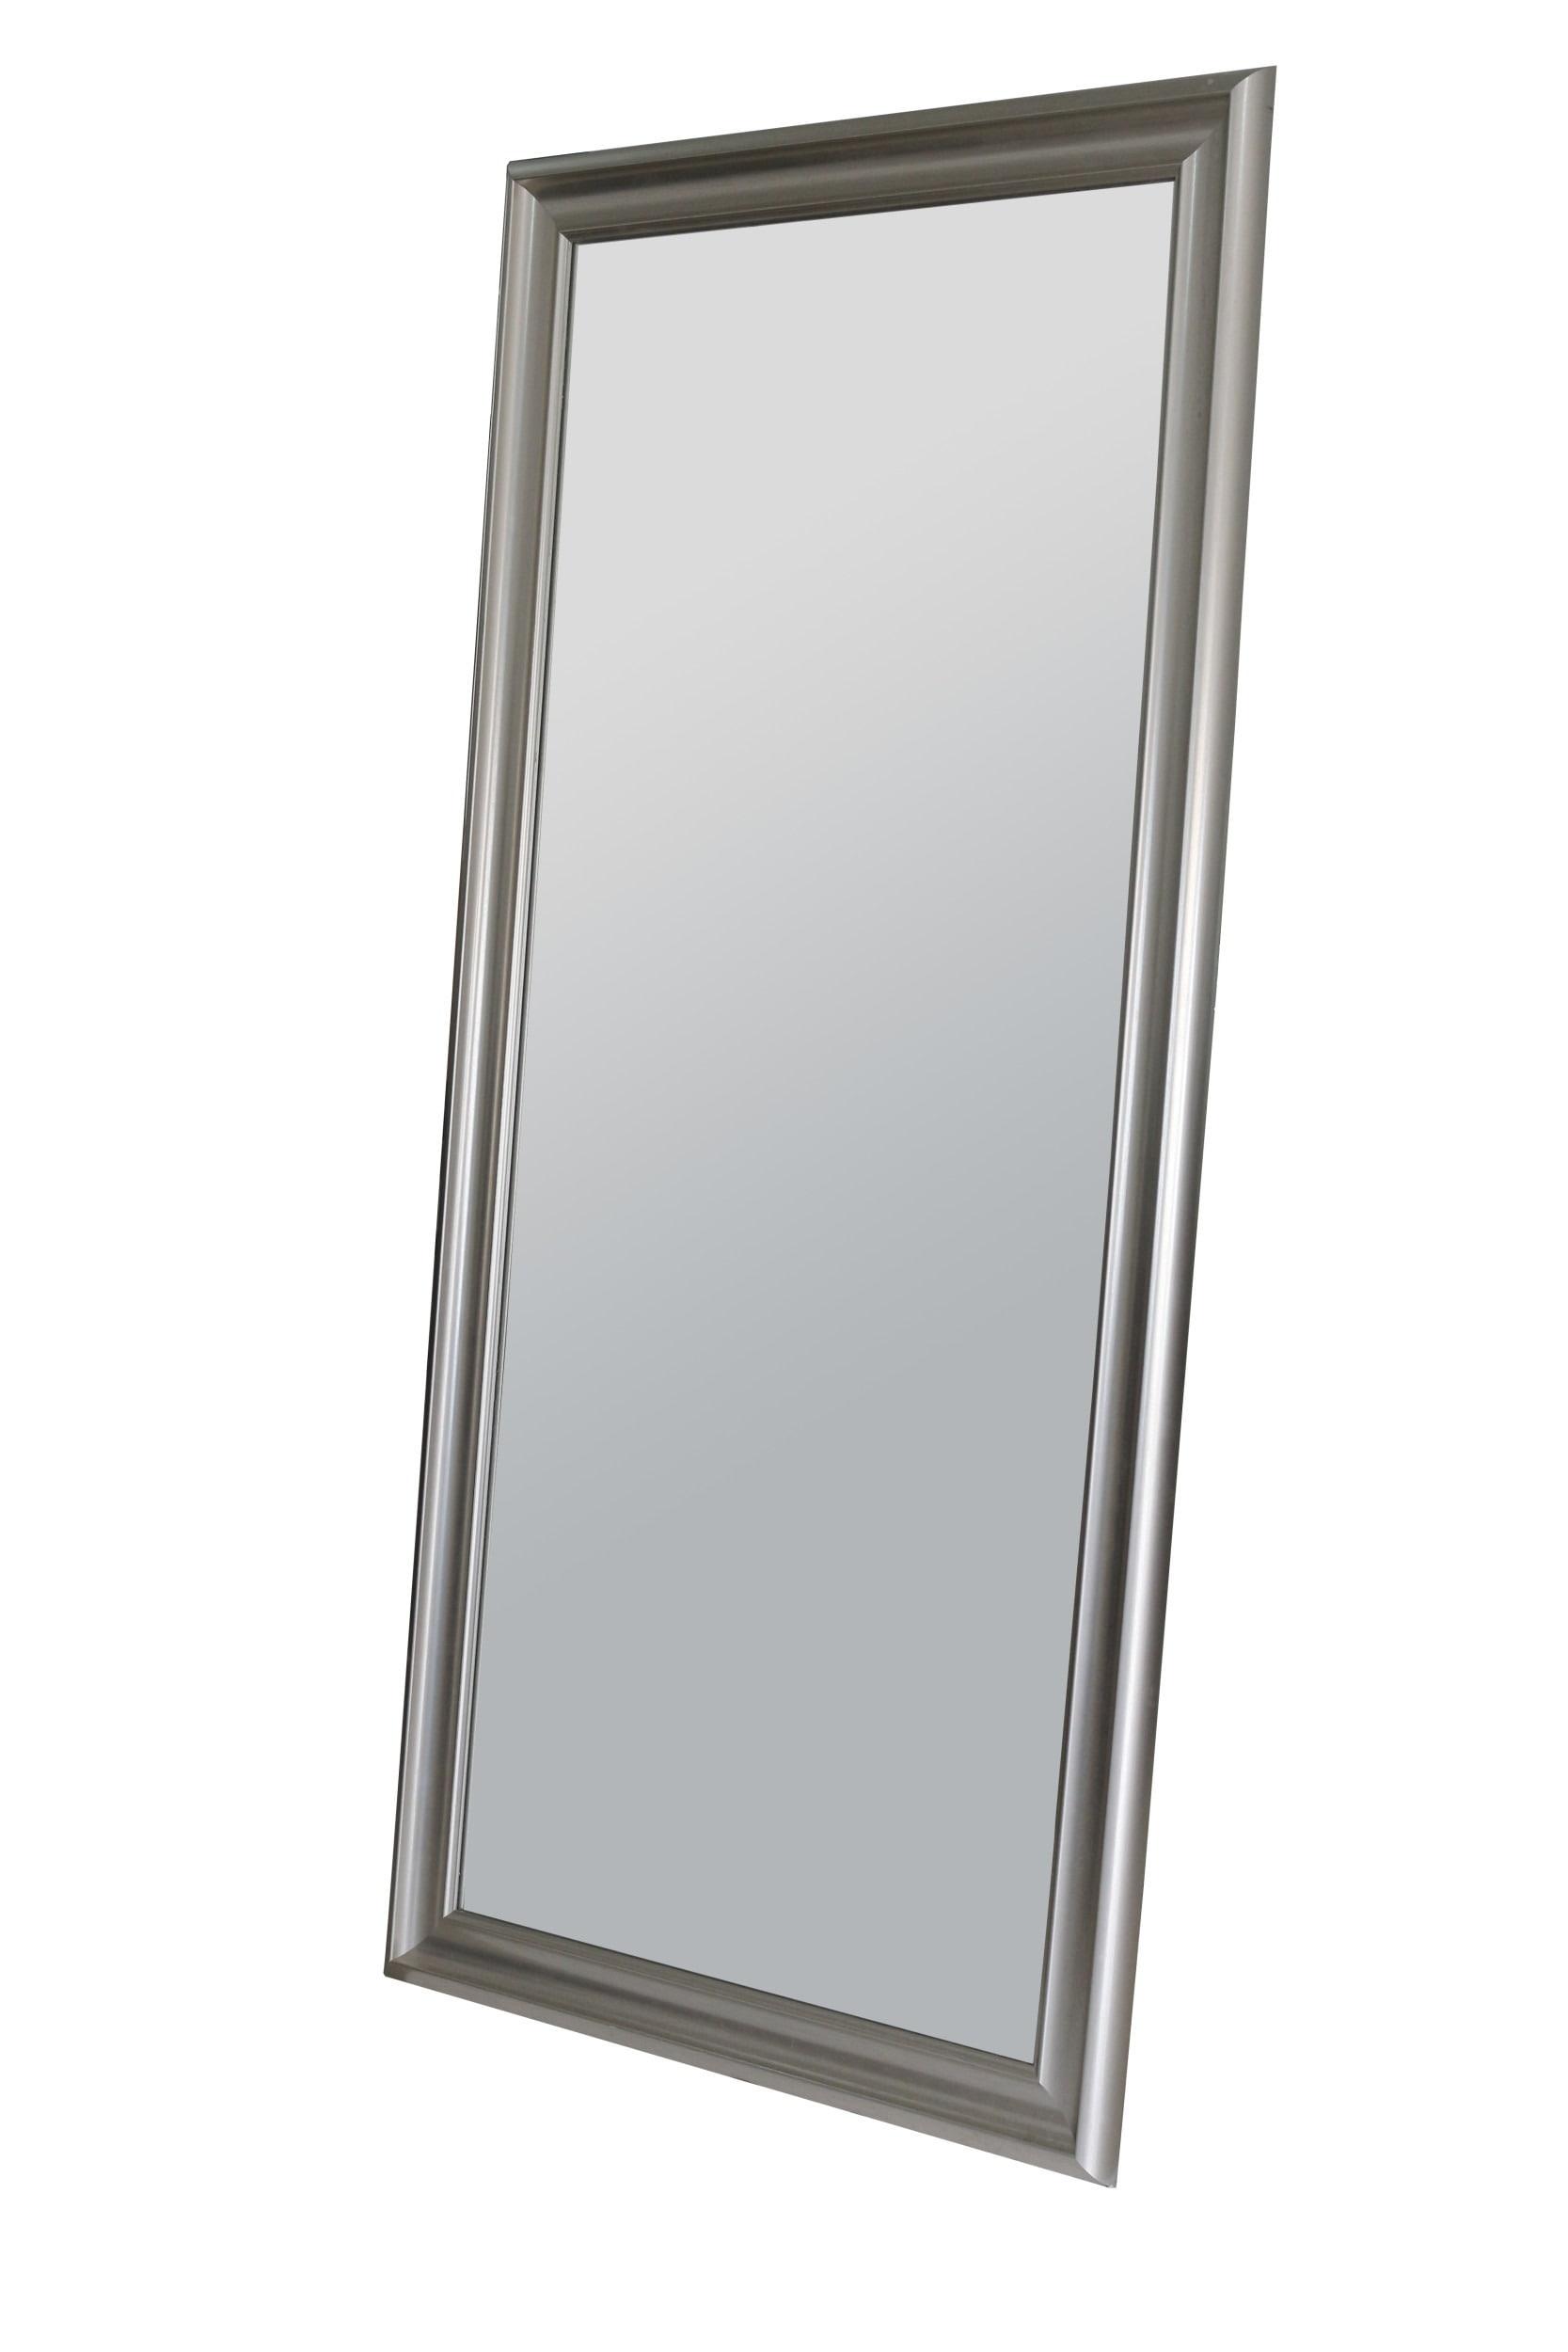 Chic home bleeker mirror modern burnished rectangular wall mirror chic home bleeker mirror modern burnished rectangular wall mirror amipublicfo Gallery